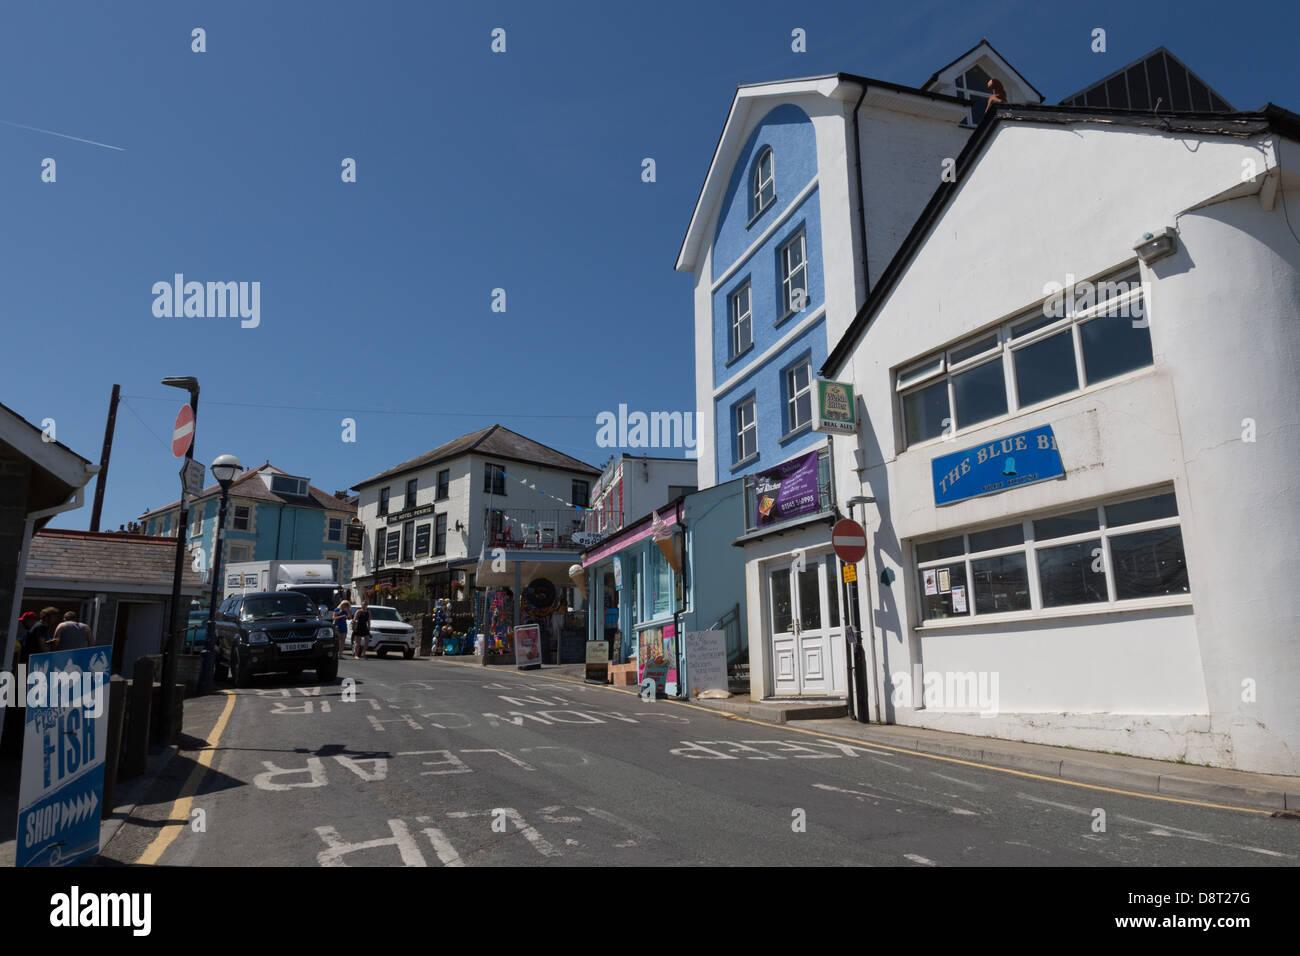 New Quay, Ceredigion, Wales - Stock Image